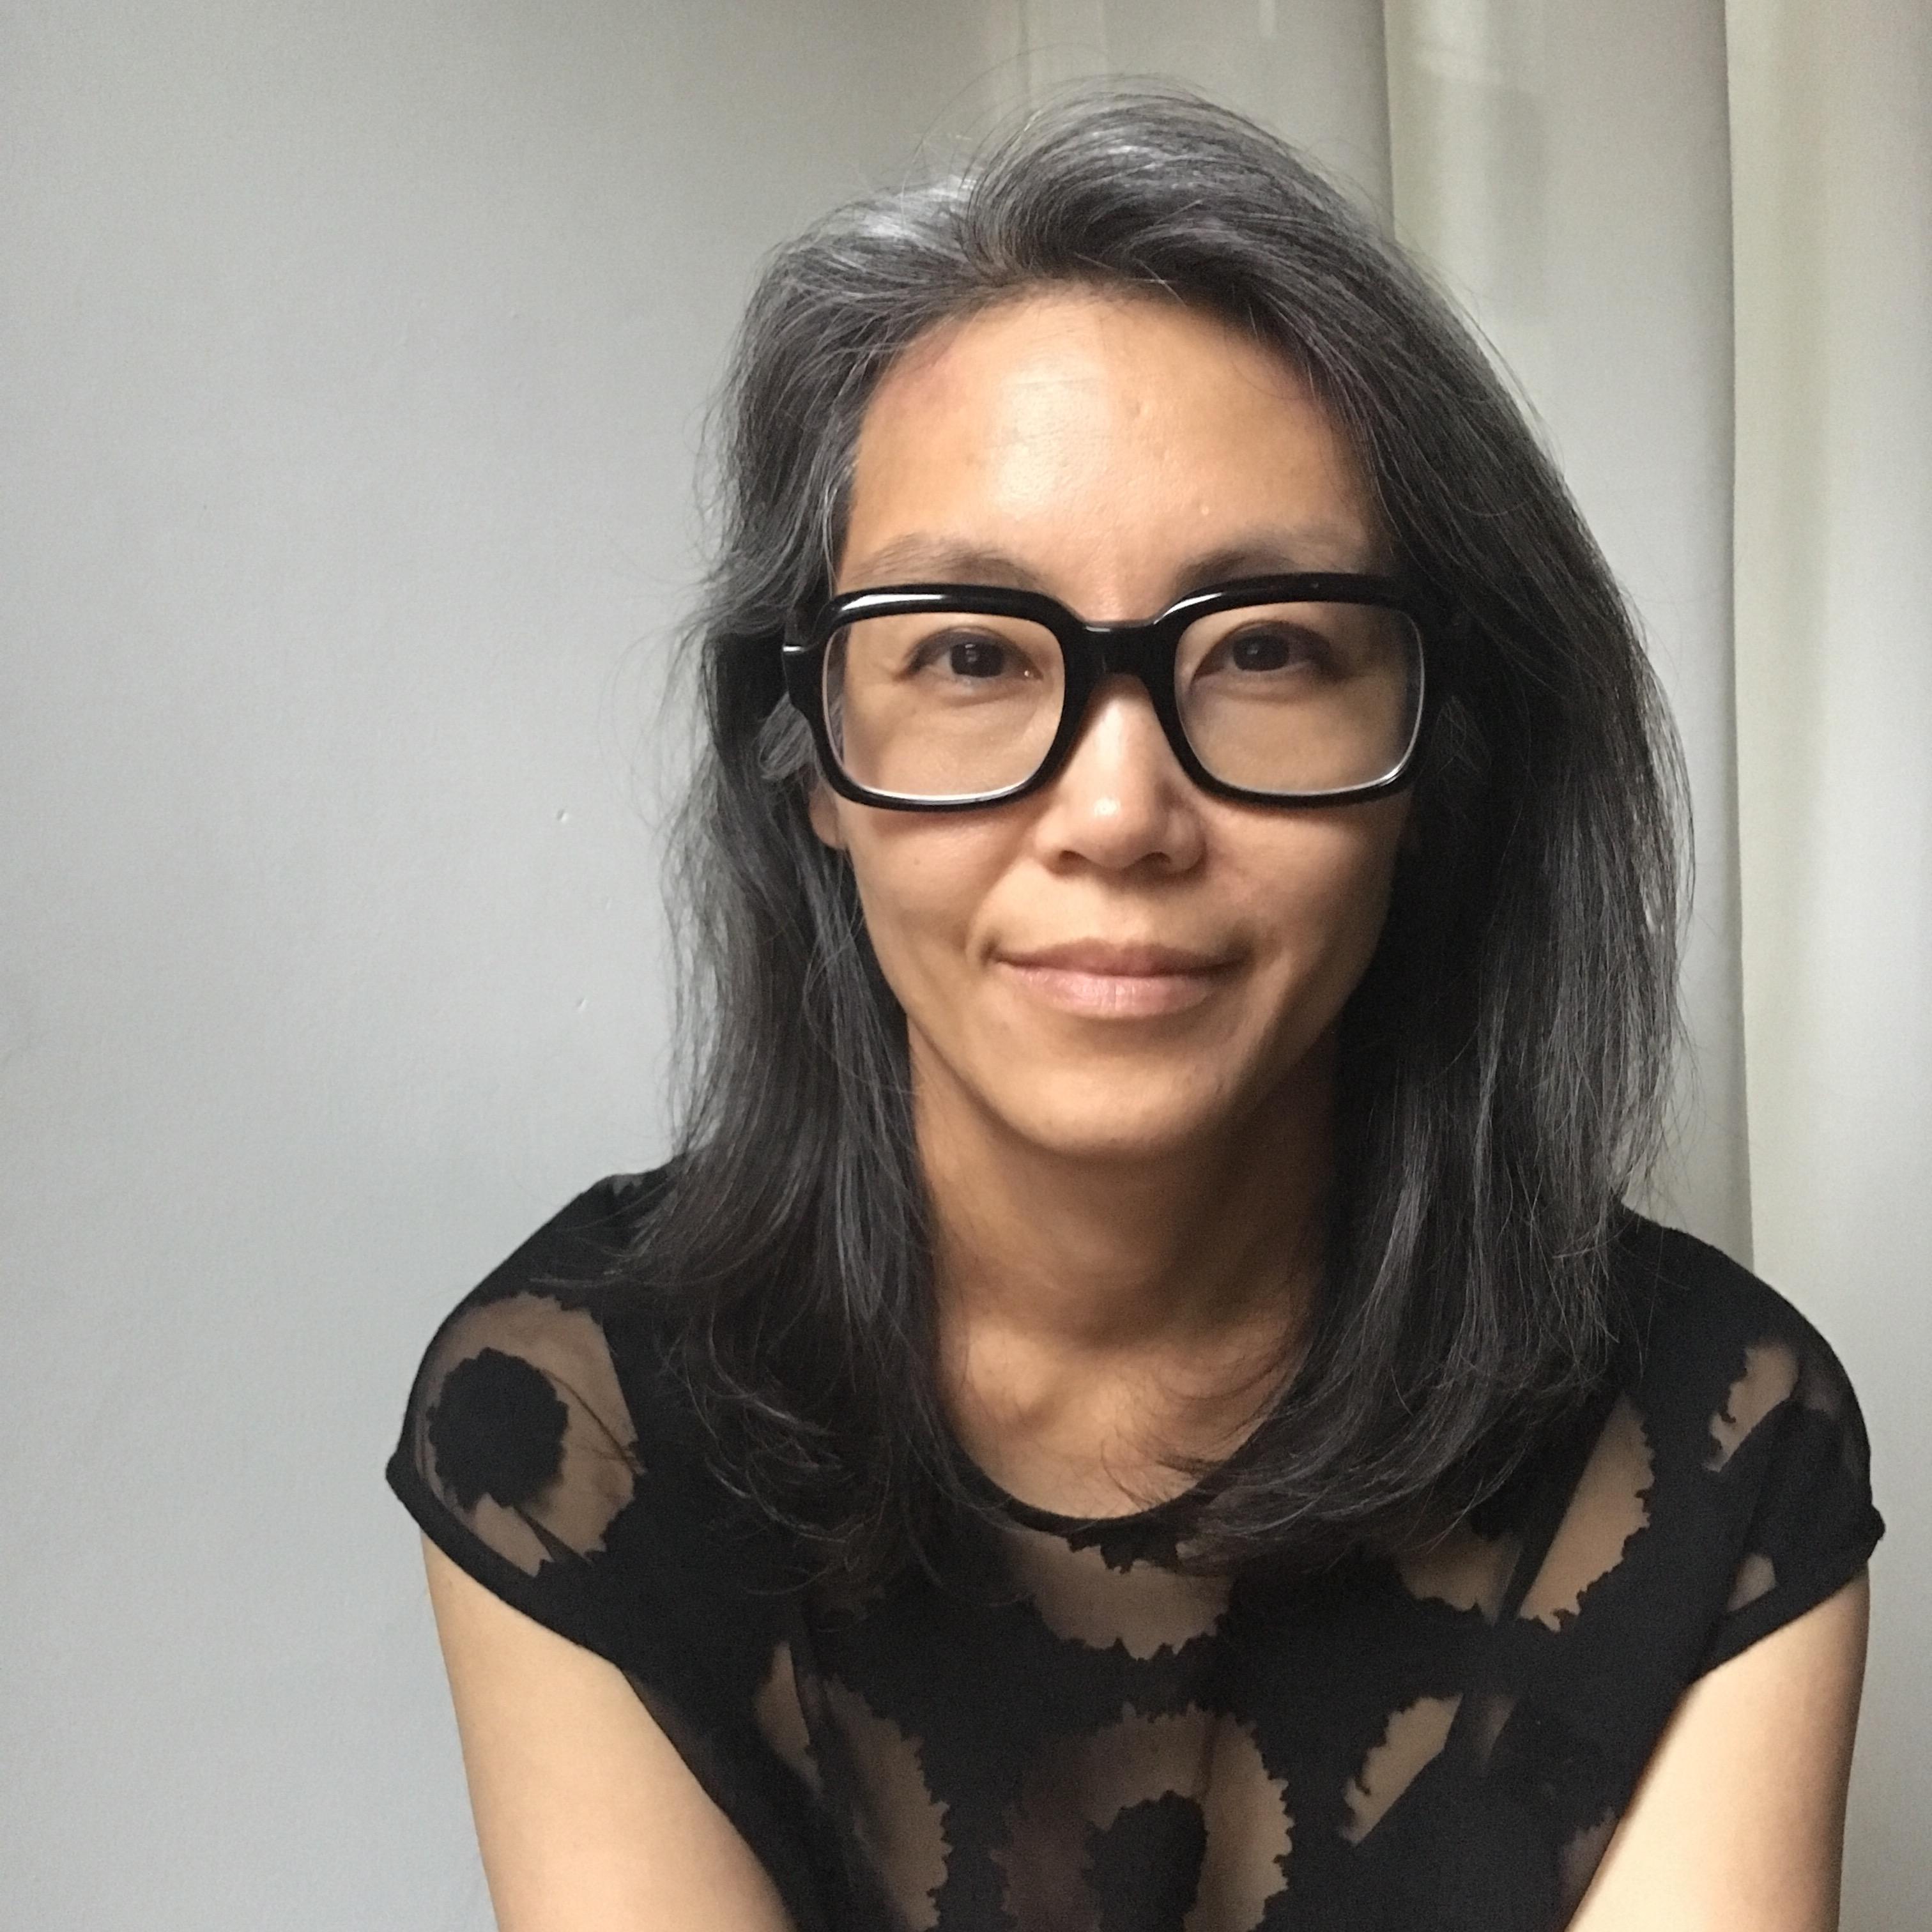 Headshot of Kay Takeda with black glasses and black shirt on.